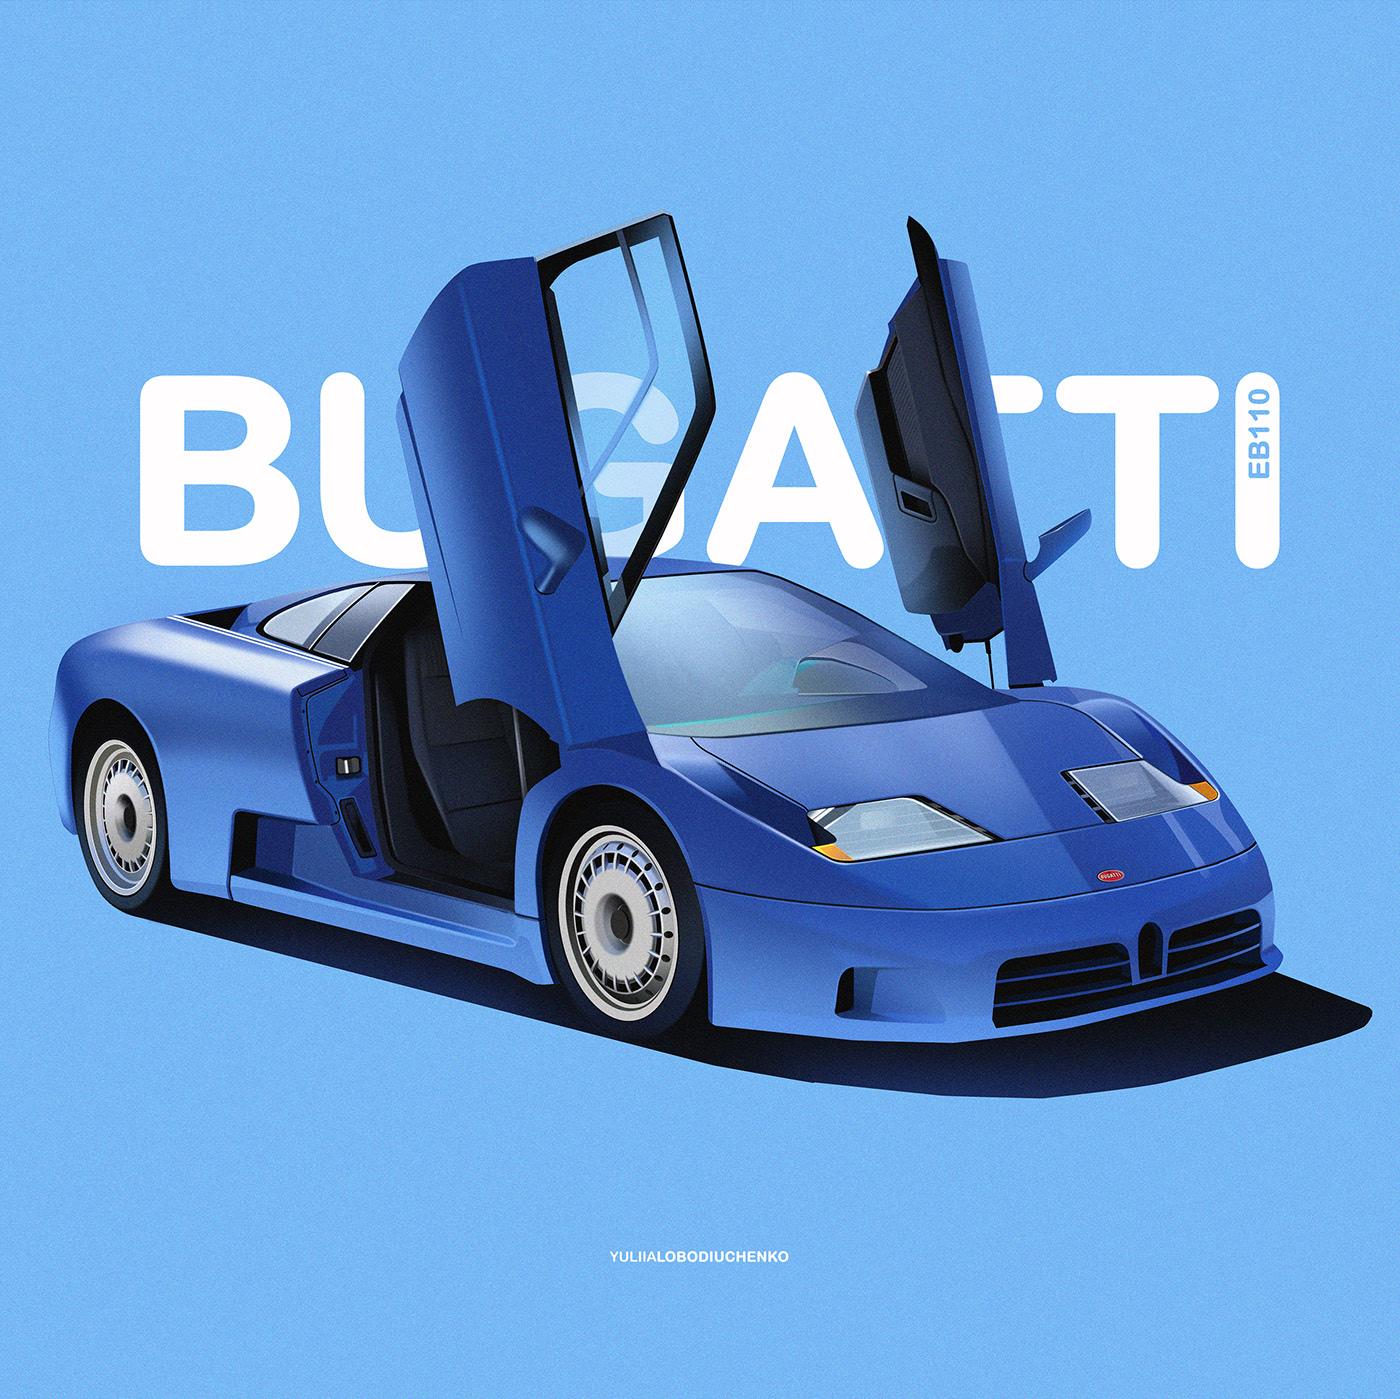 General 1400x1399 car illustration classic car Yuliia Lobodiuchenko Bugatti Bugatti EB110 open door simple background typography